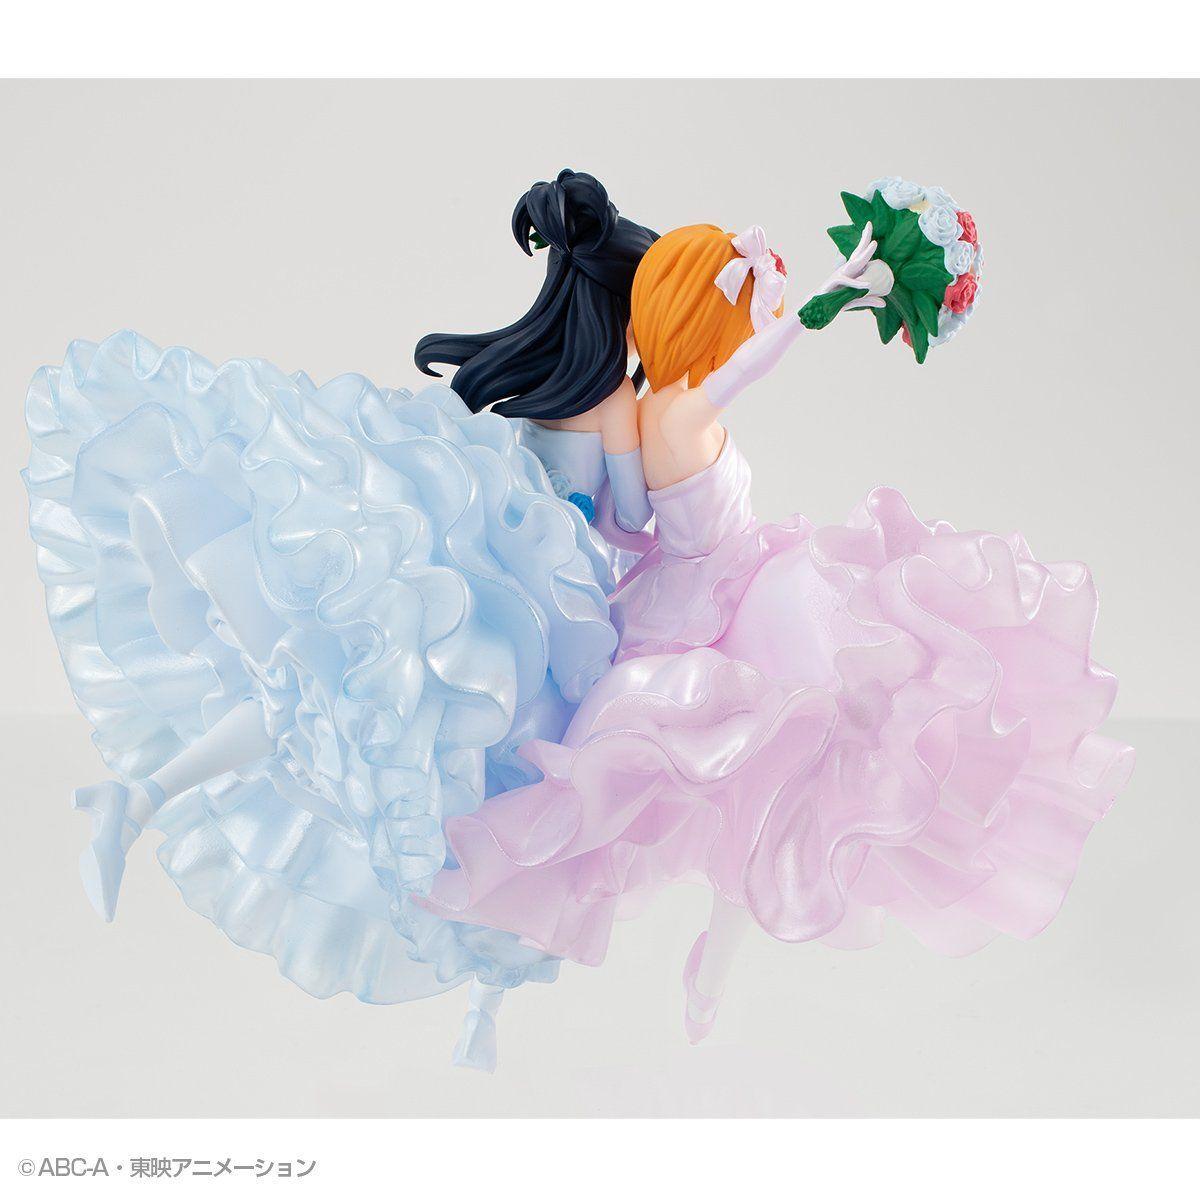 HG GIRLS『ふたりはプリキュアメモリアルフィギュア』完成品フィギュア-003